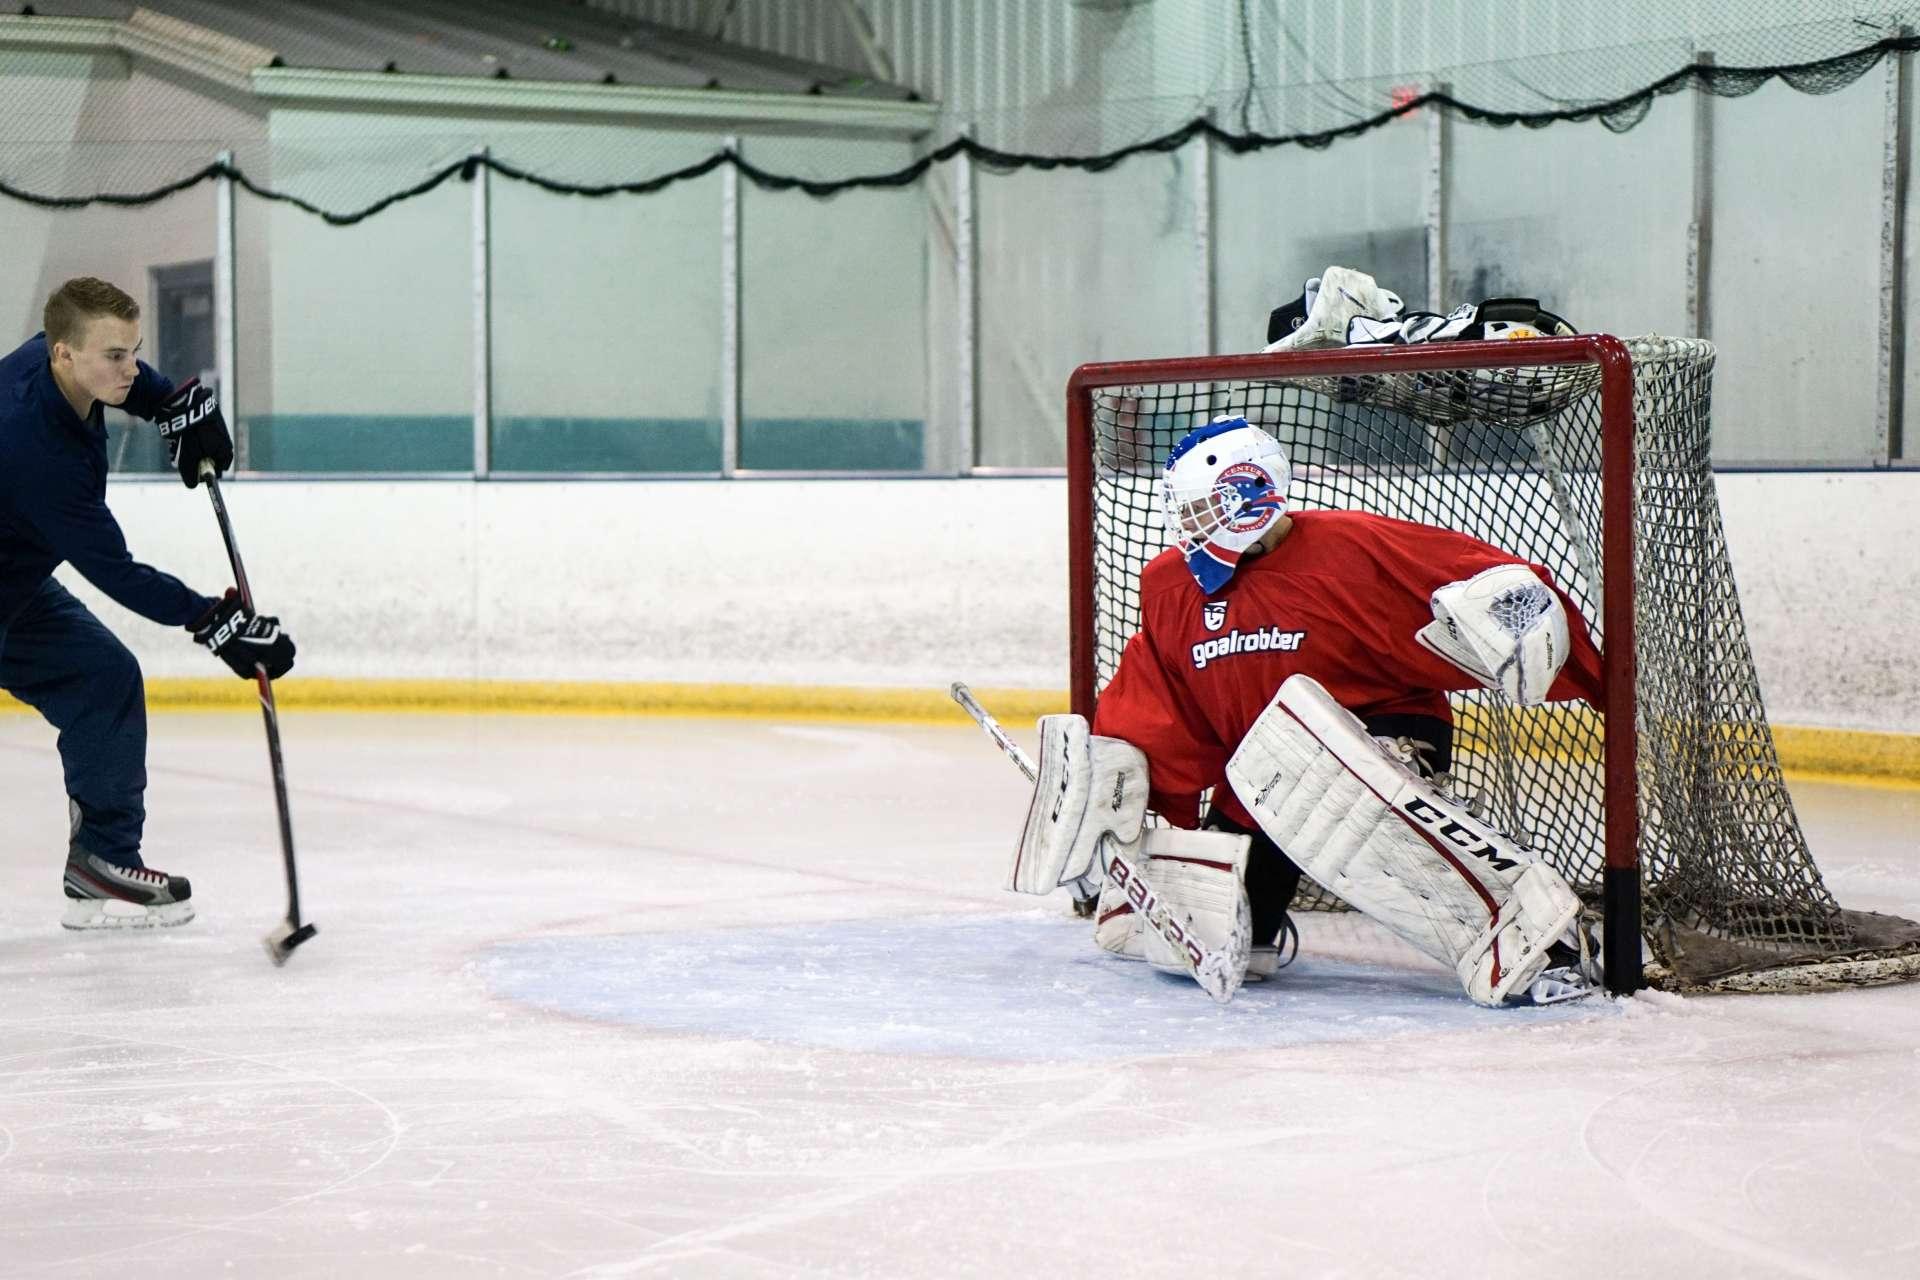 Elite Goalie Training Program Goalrobber Hockey Schools